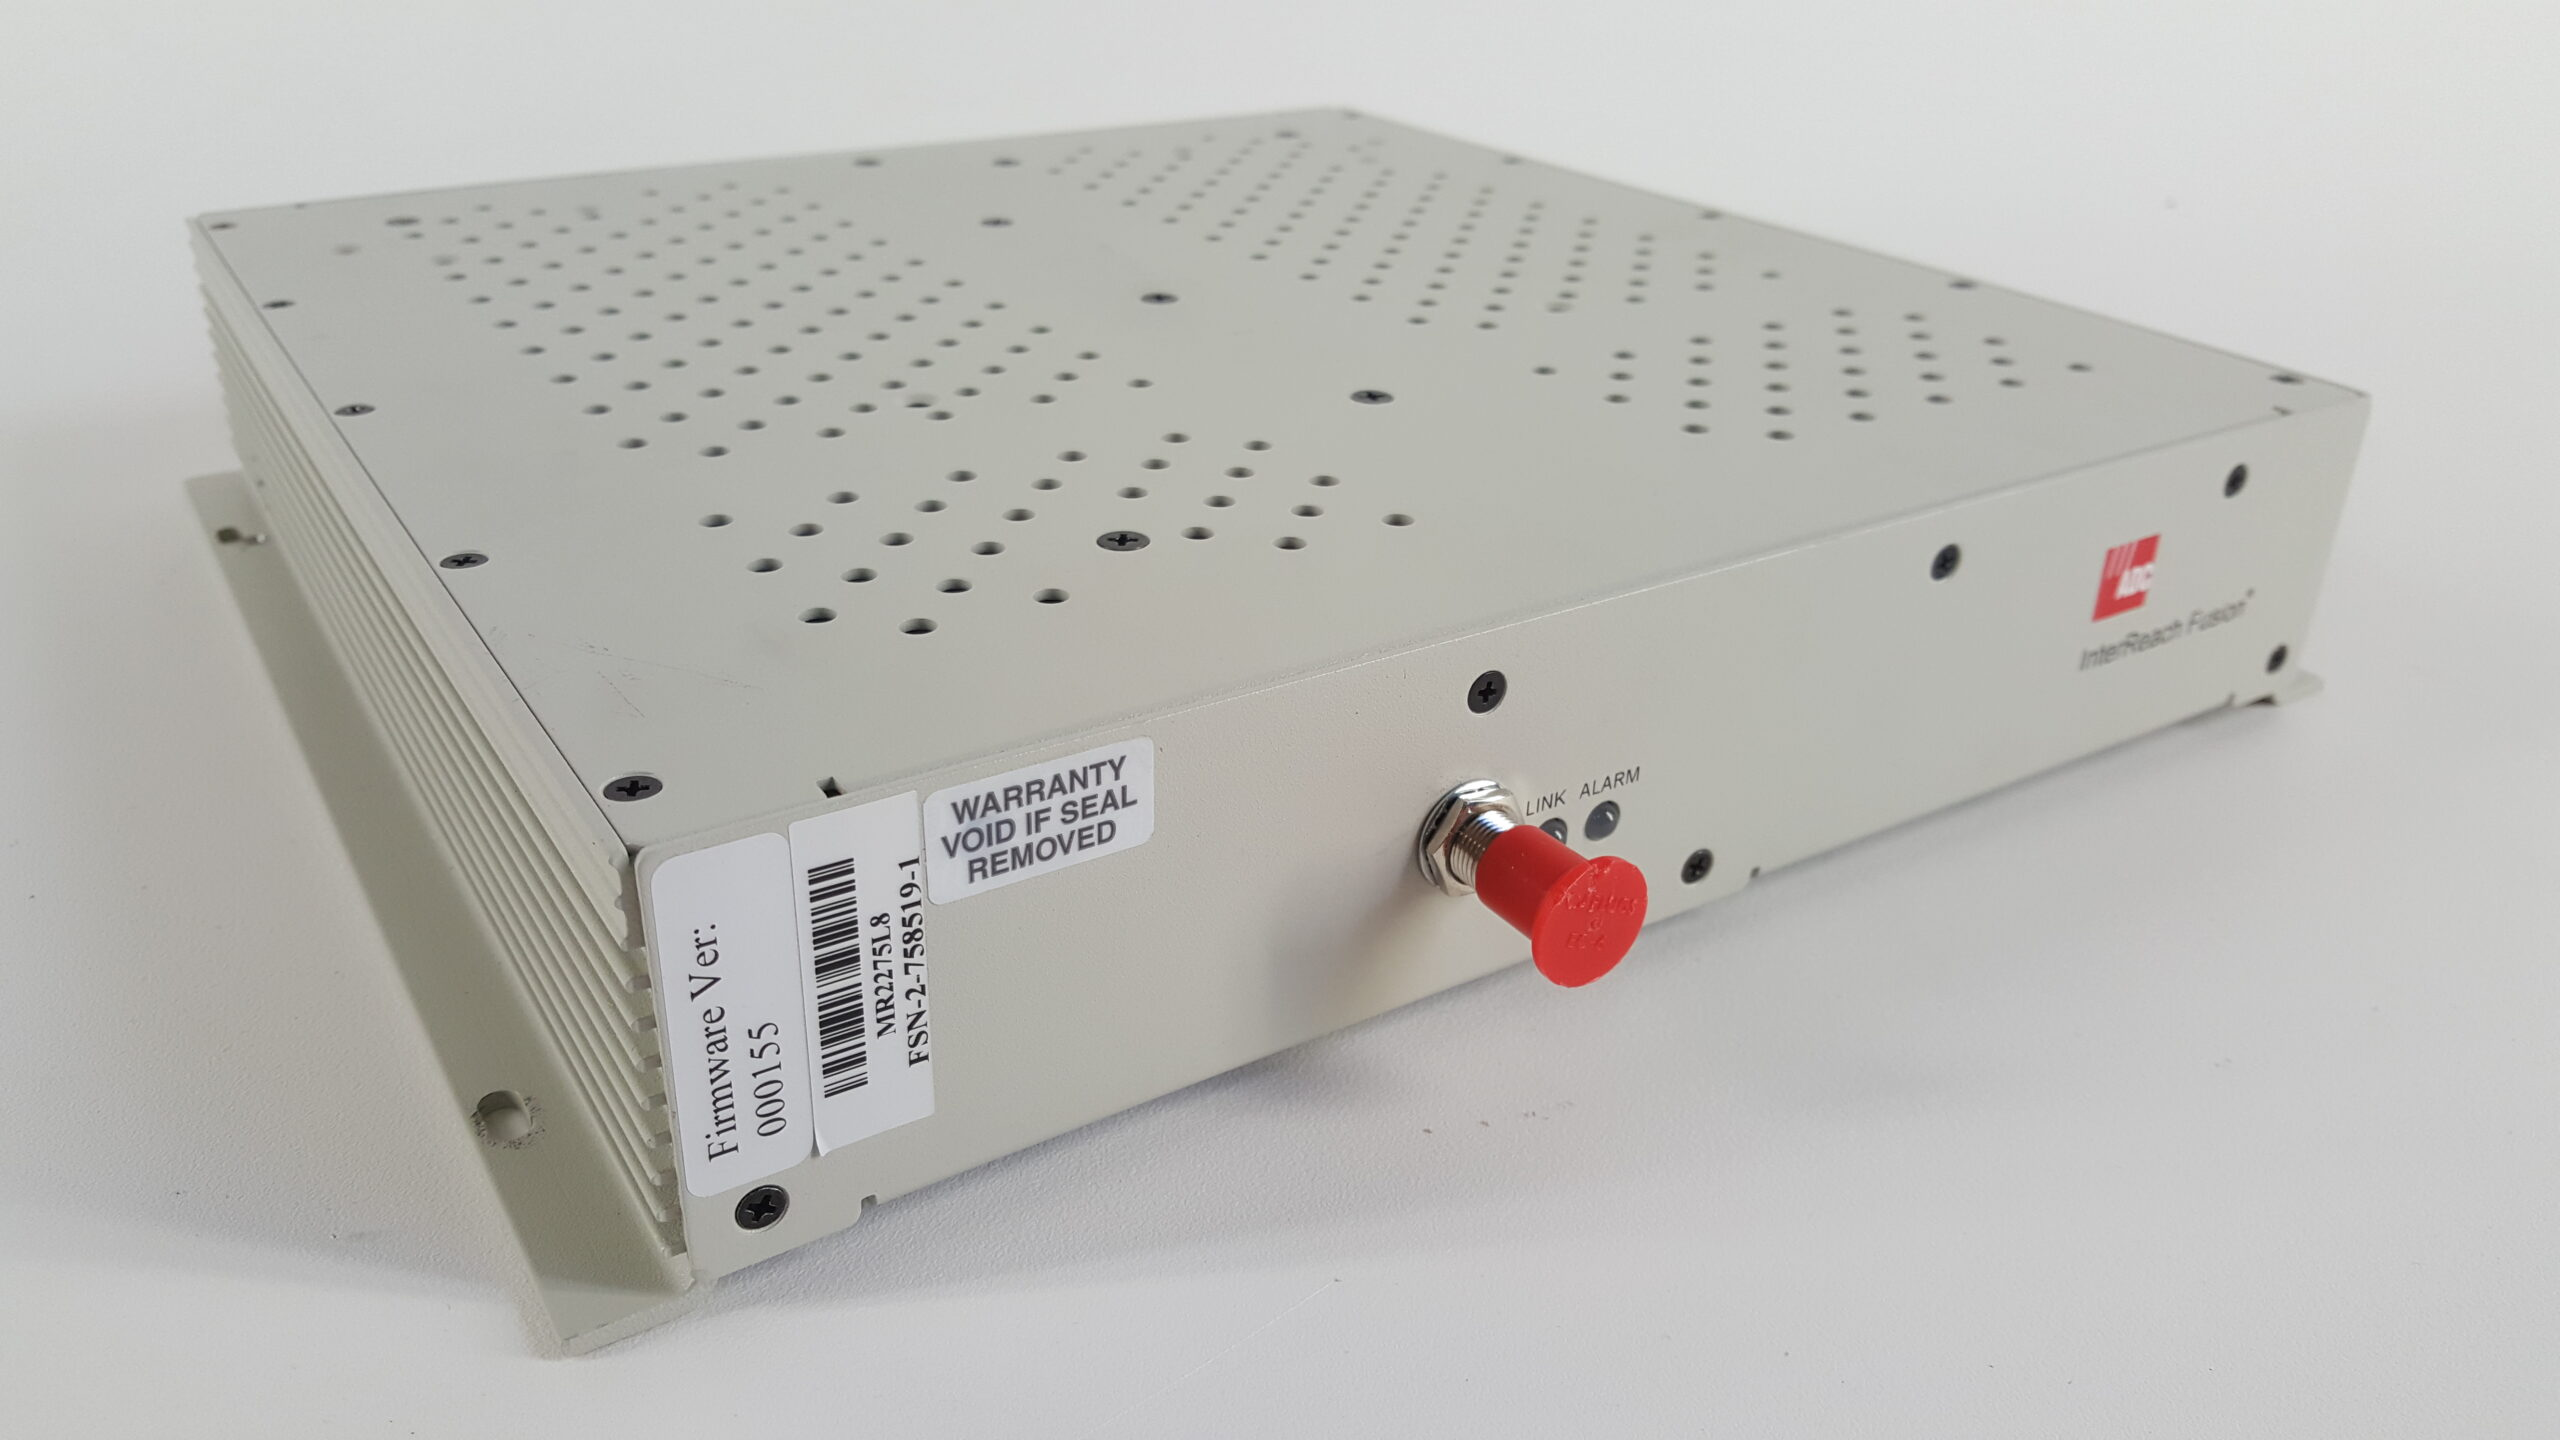 ADC InterReach Fusion FSN-2-758519-1-HP